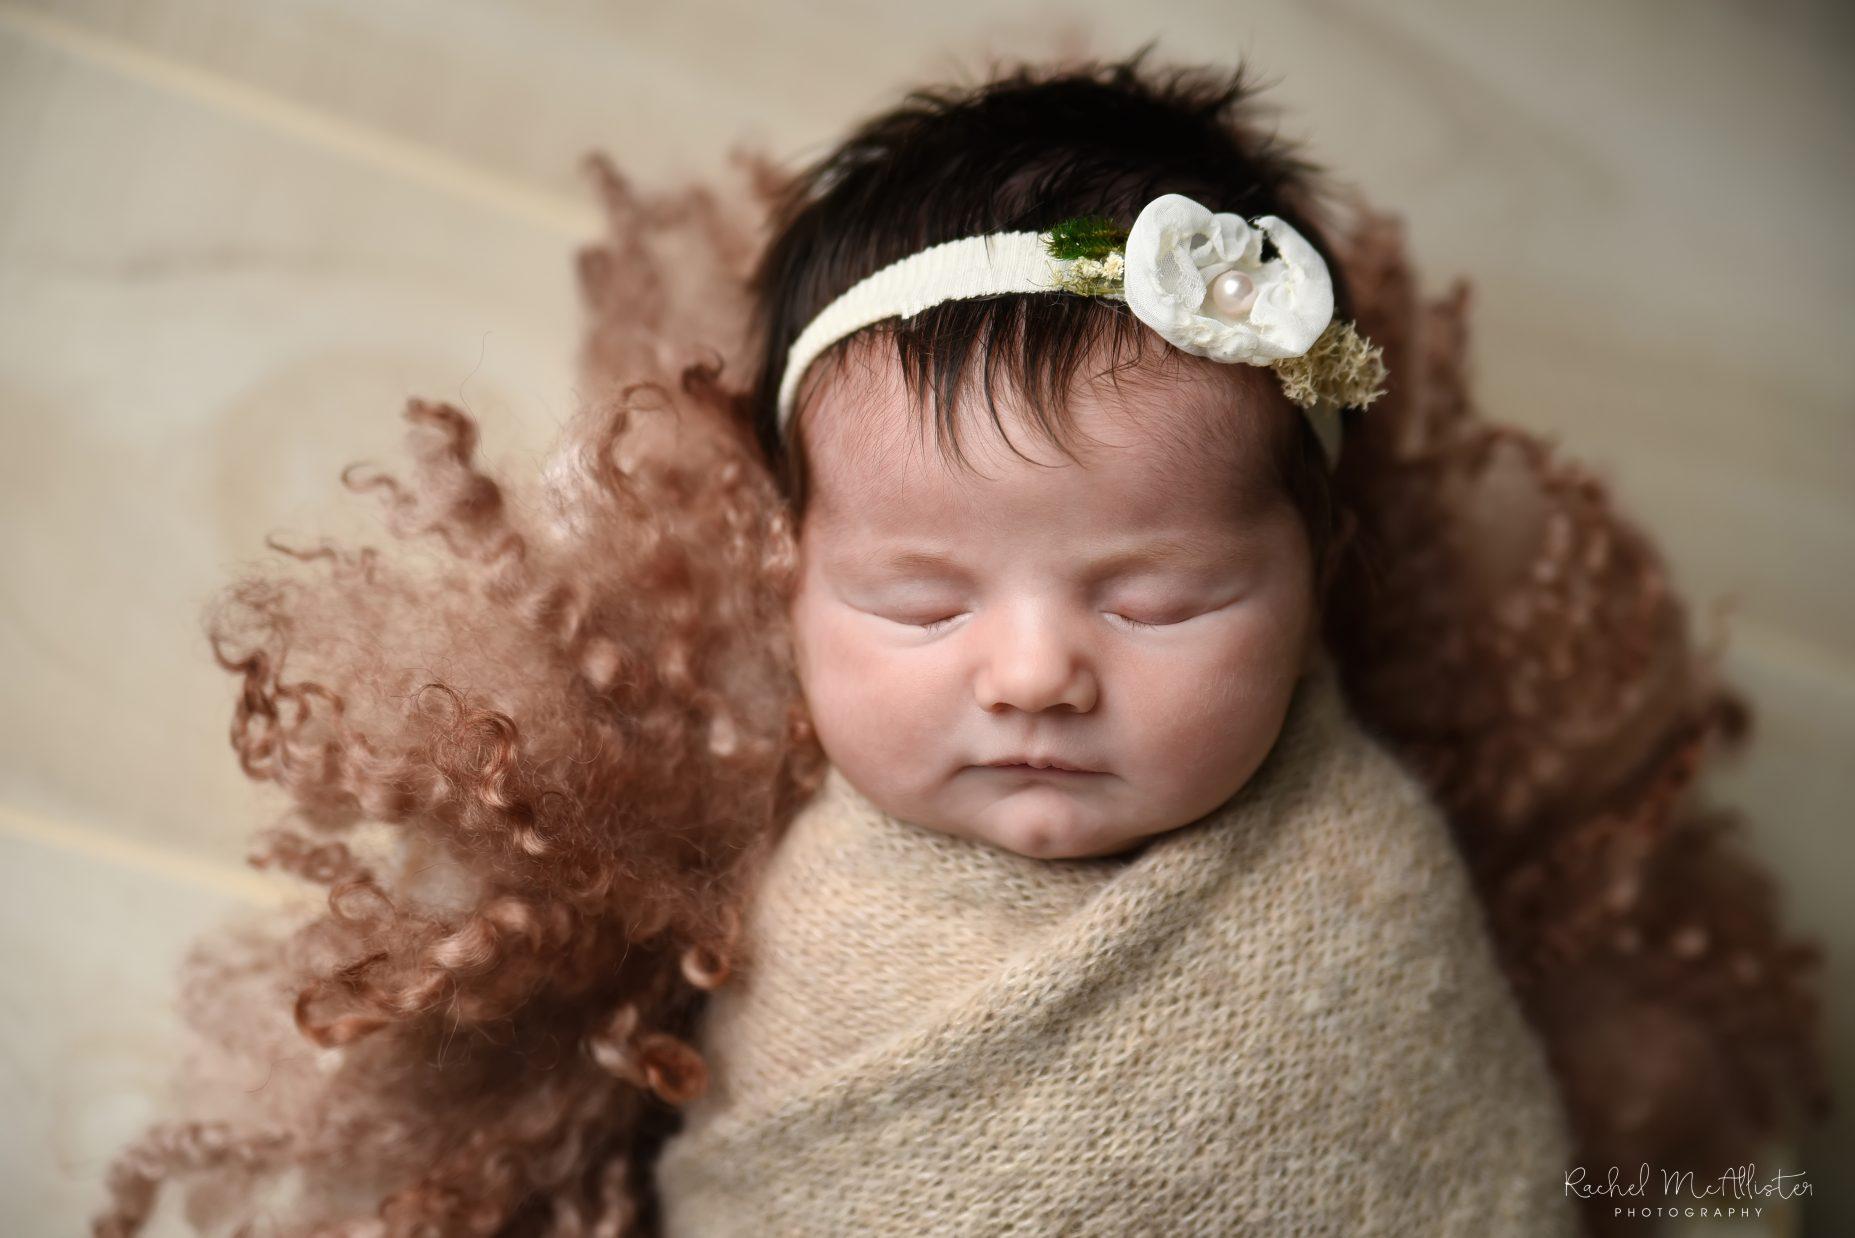 Tazelaar Newborn